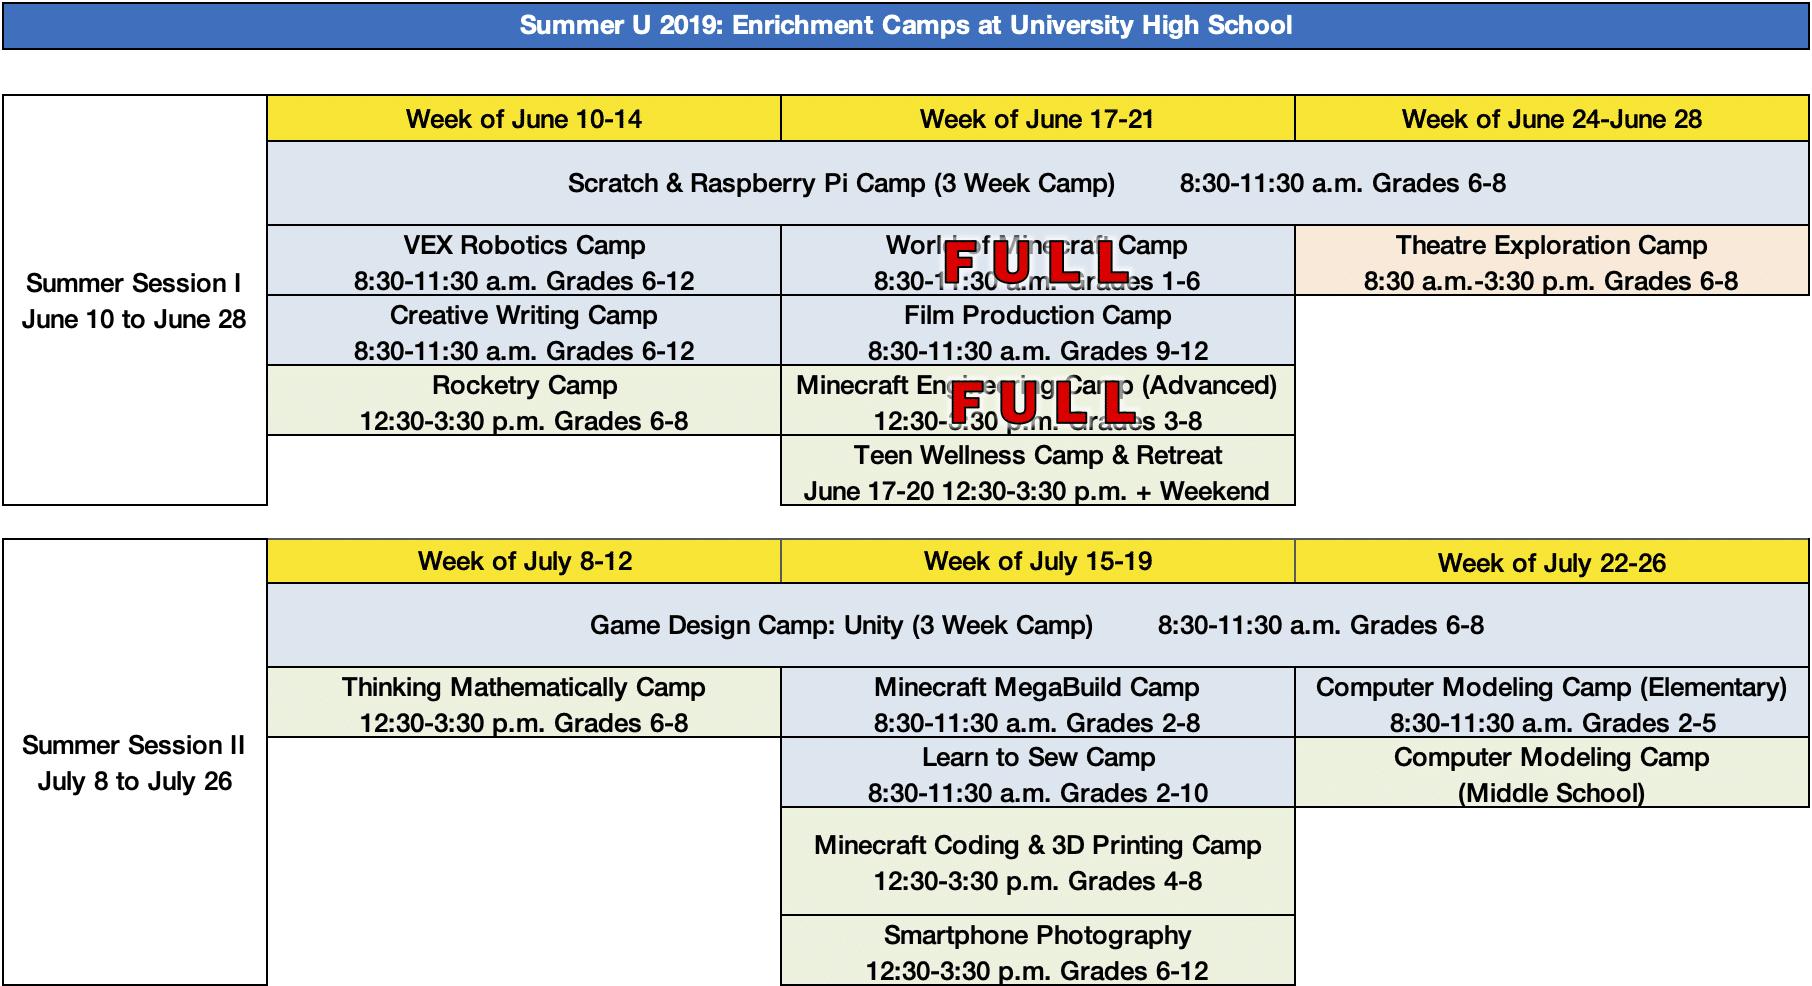 Enrichment Summer Camps - Summer U 2017 - University High School